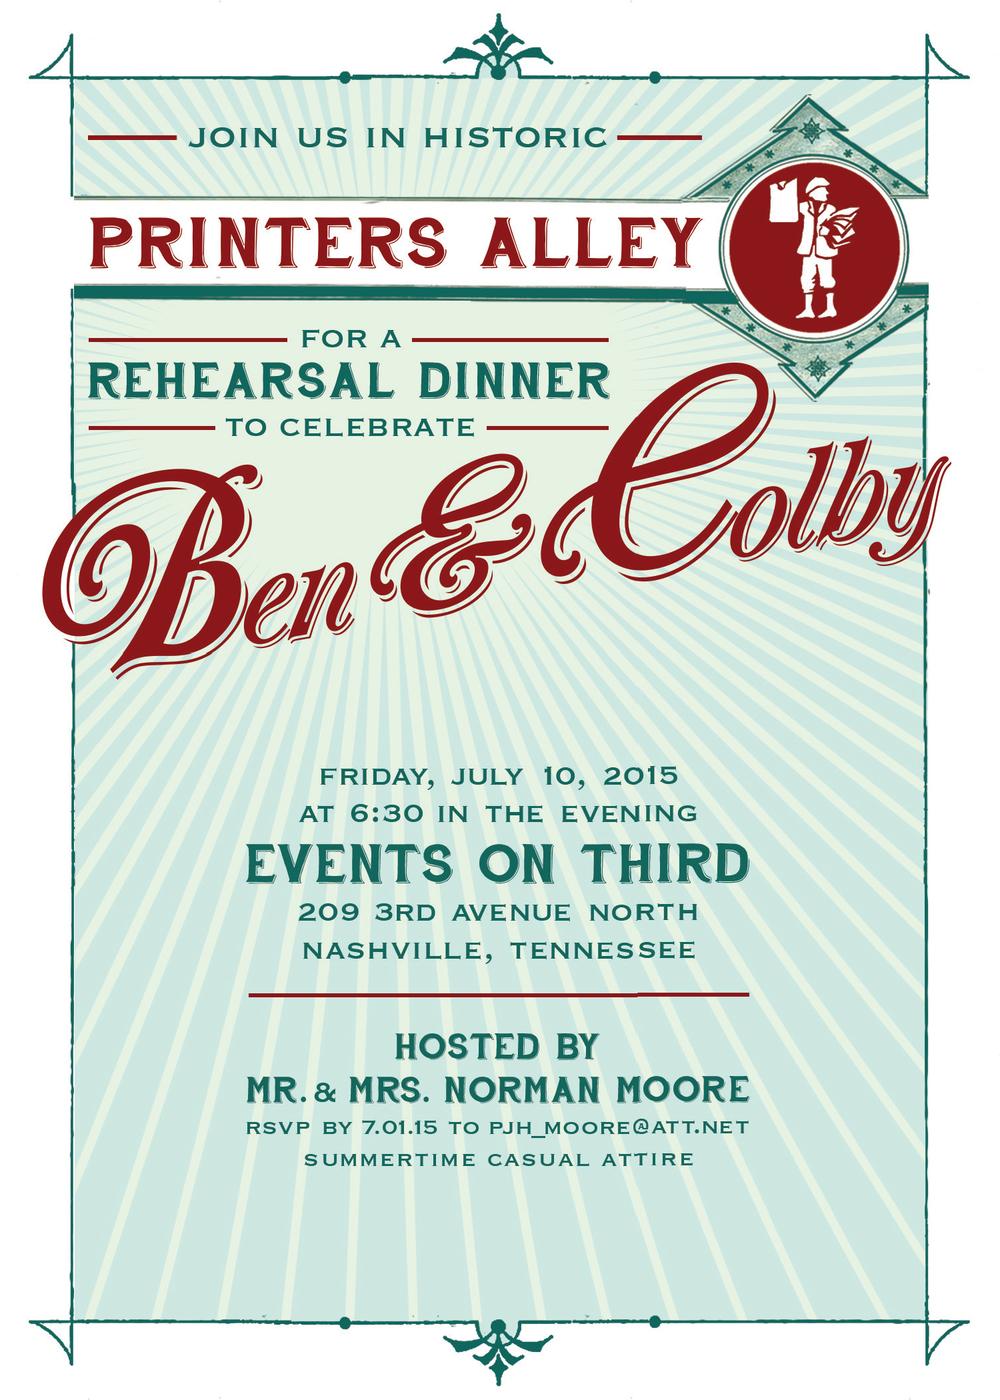 Printers-Alley-Rehearsal-Dinner.jpg